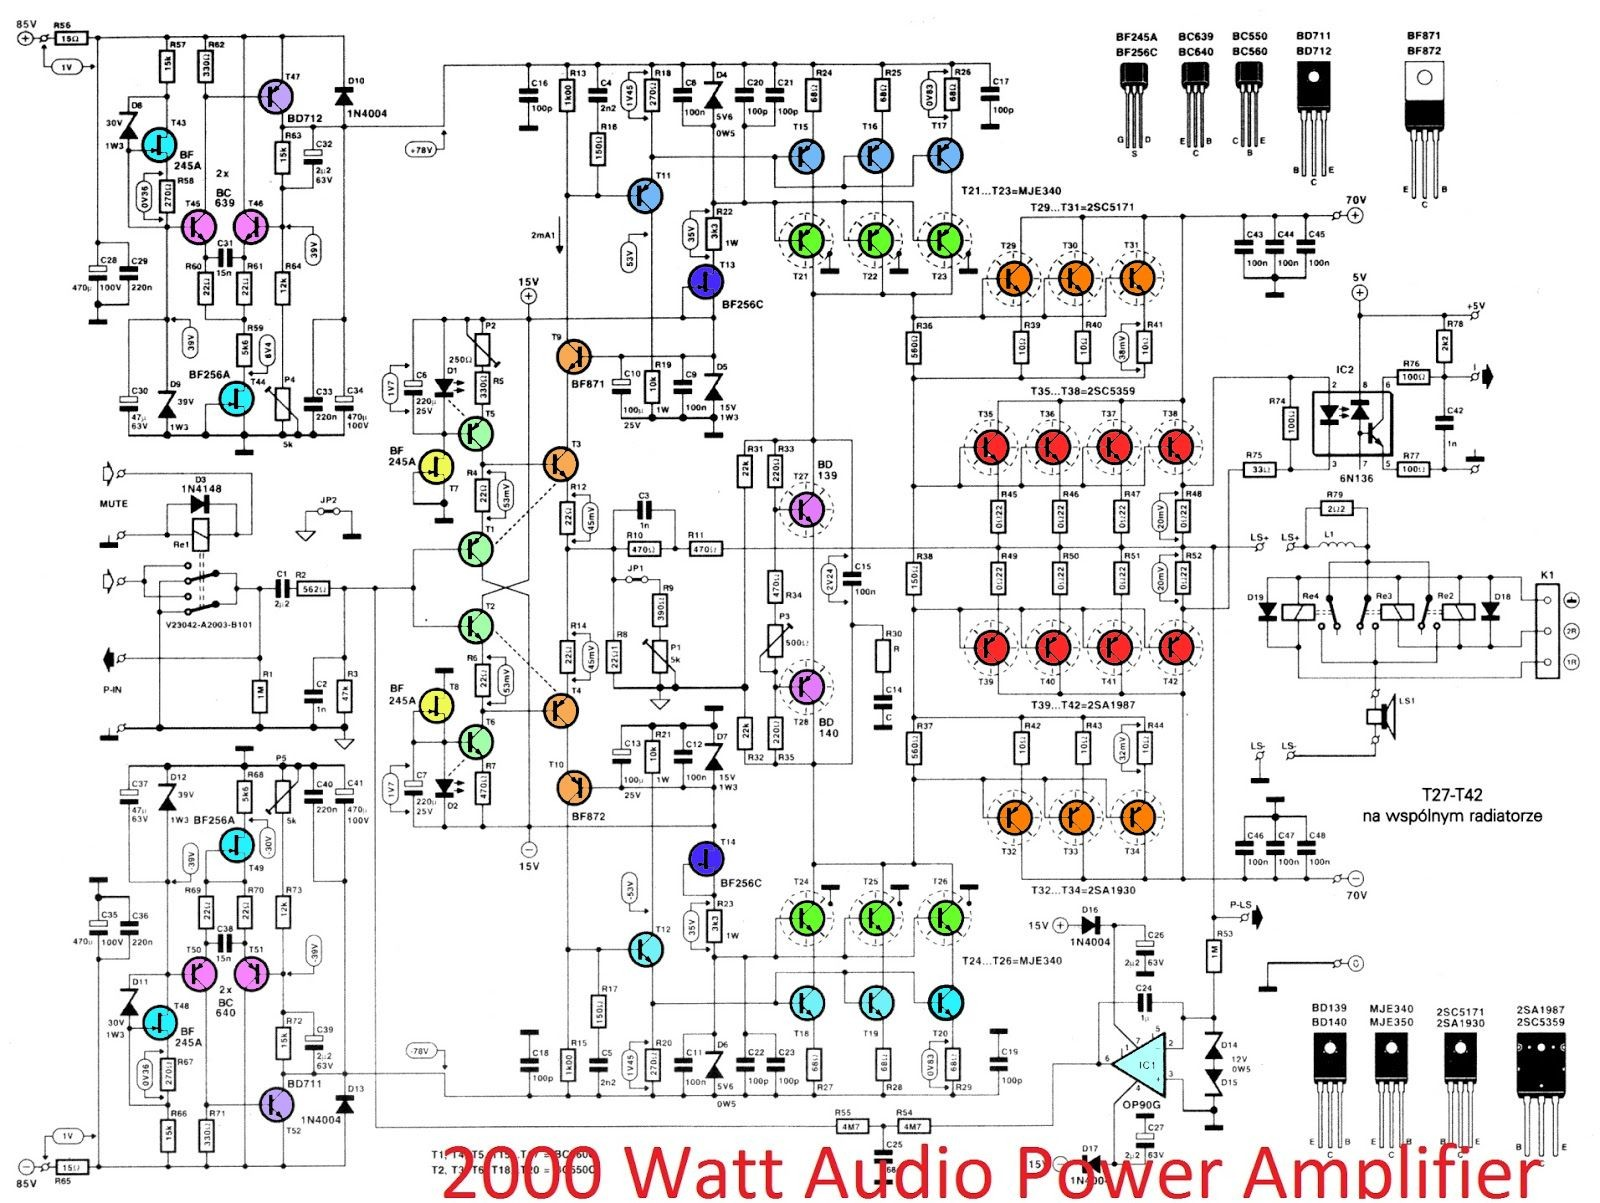 Car Audio Amplifier Circuit Diagram 2000w High Power Amplifier 2sc5359 2sa1987 Of Car Audio Amplifier Circuit Diagram